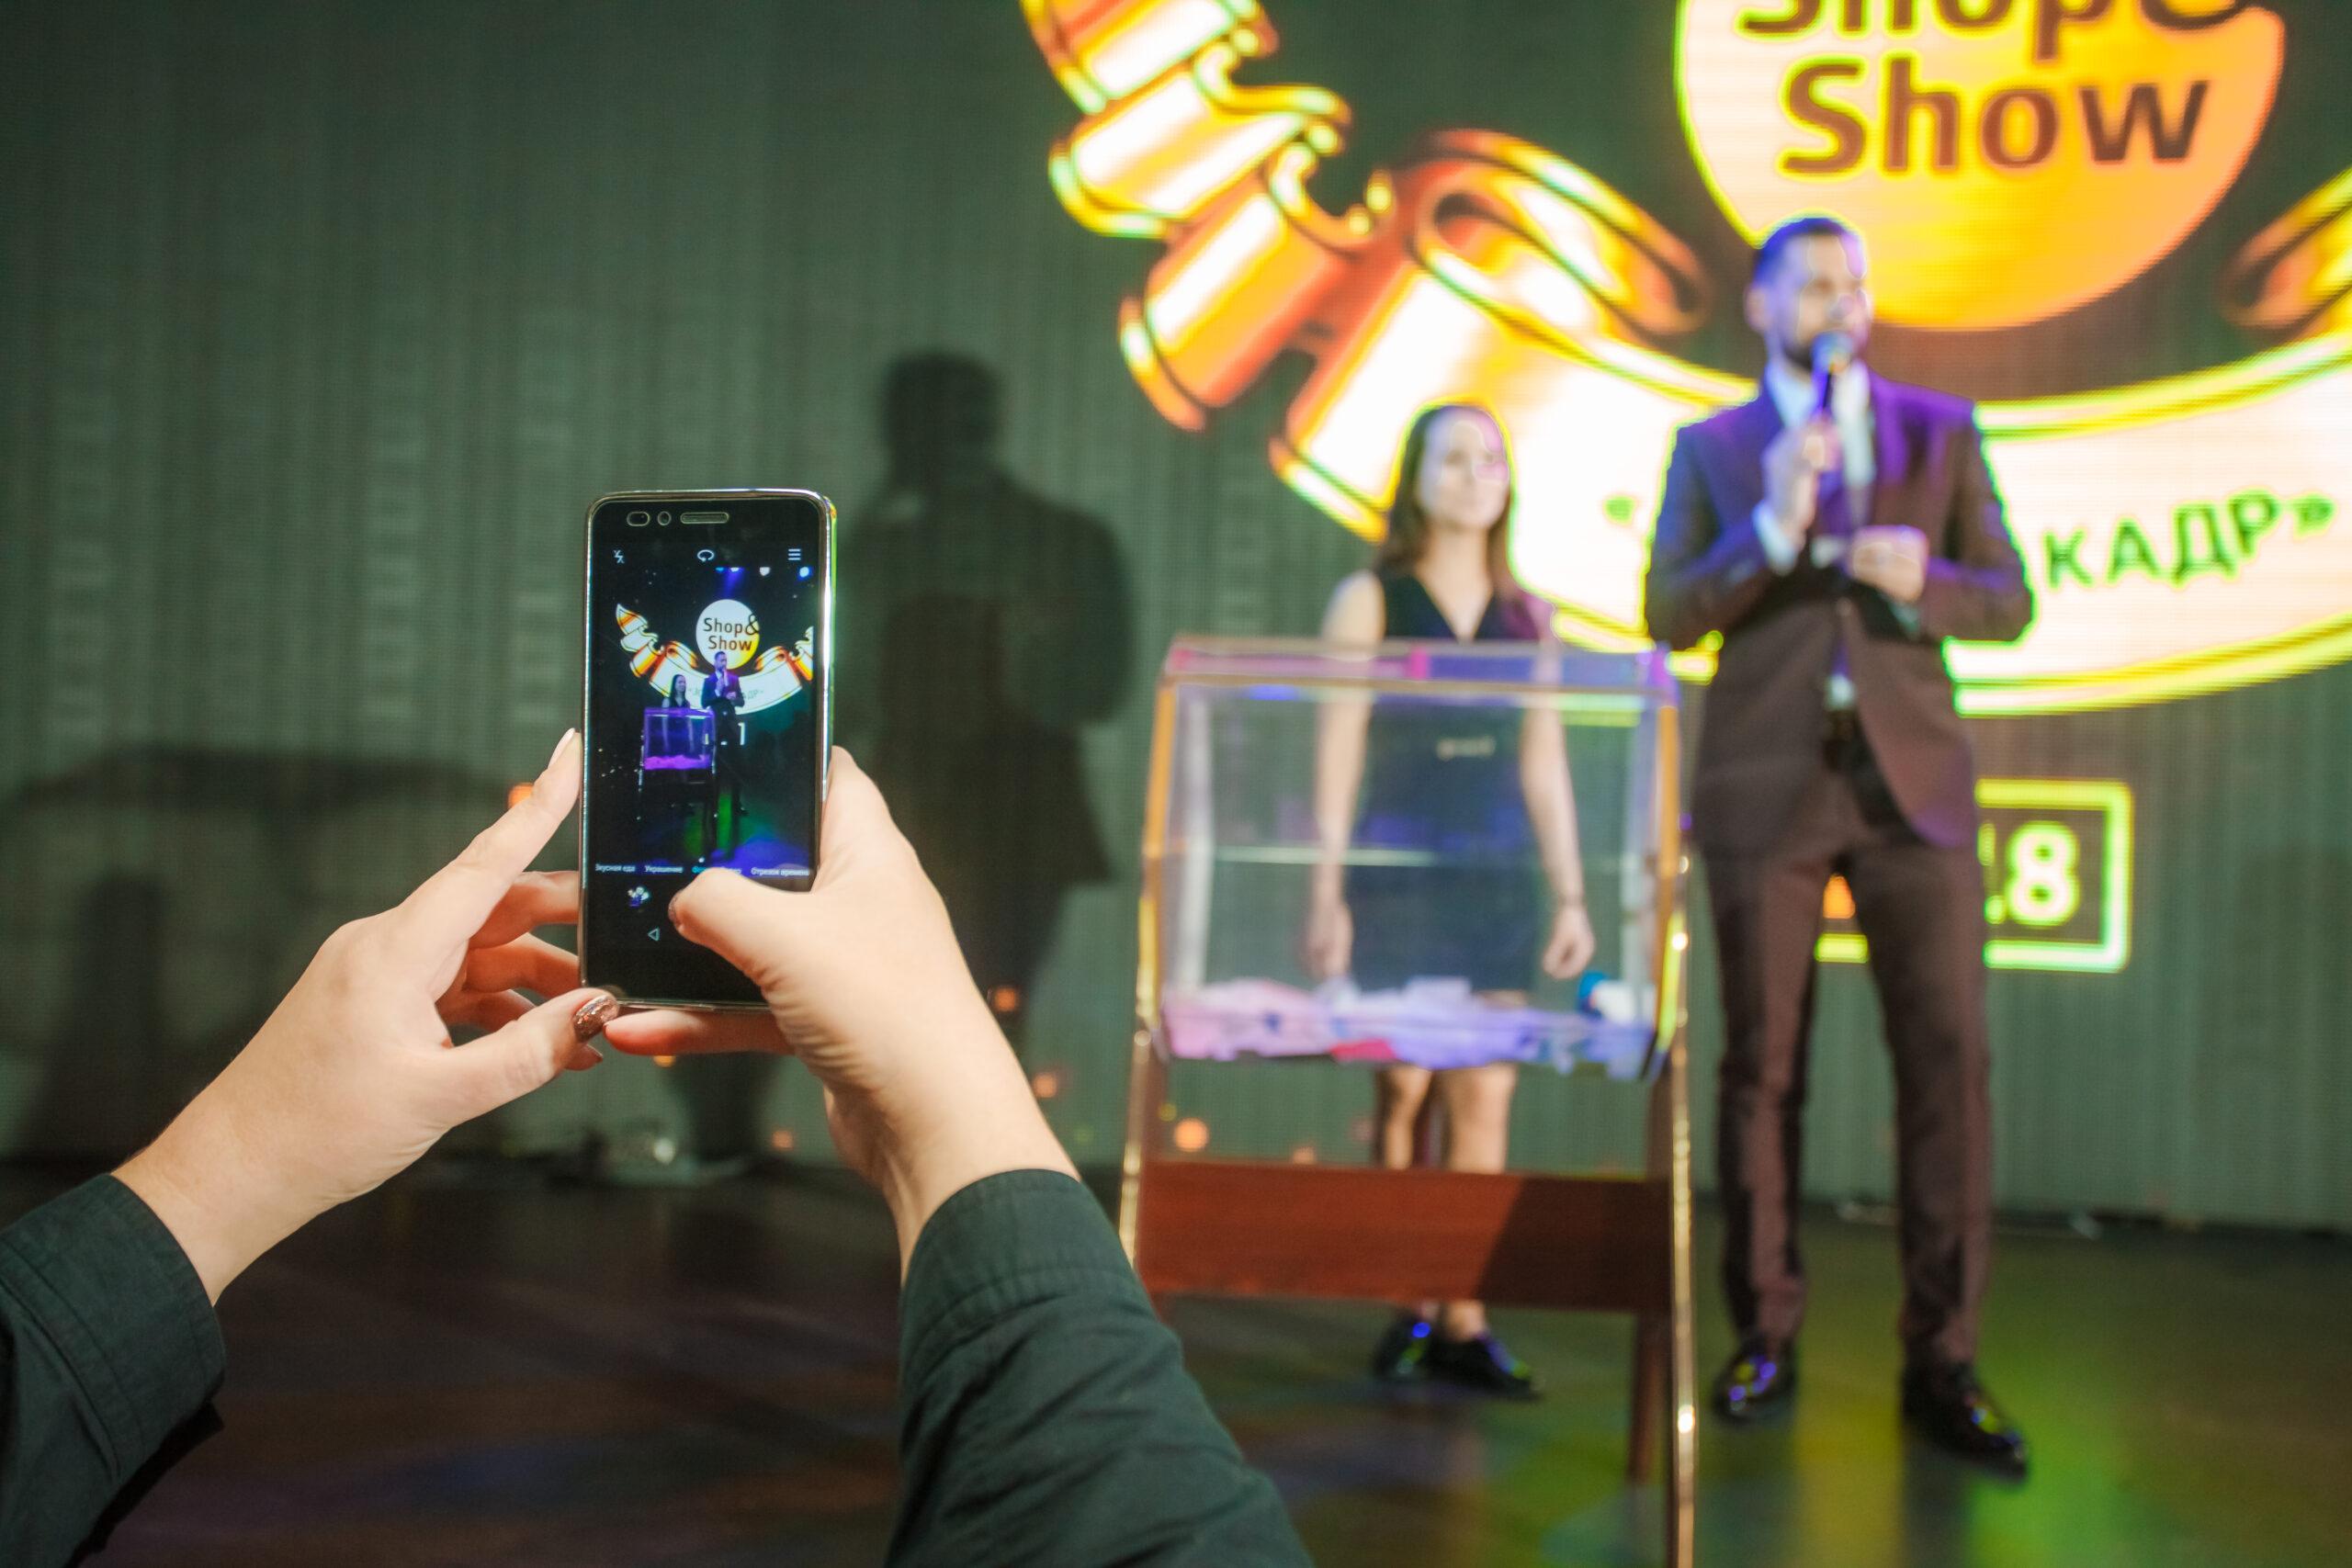 Shop & Show Золотой кадр, Elki Project   Организация мероприятий